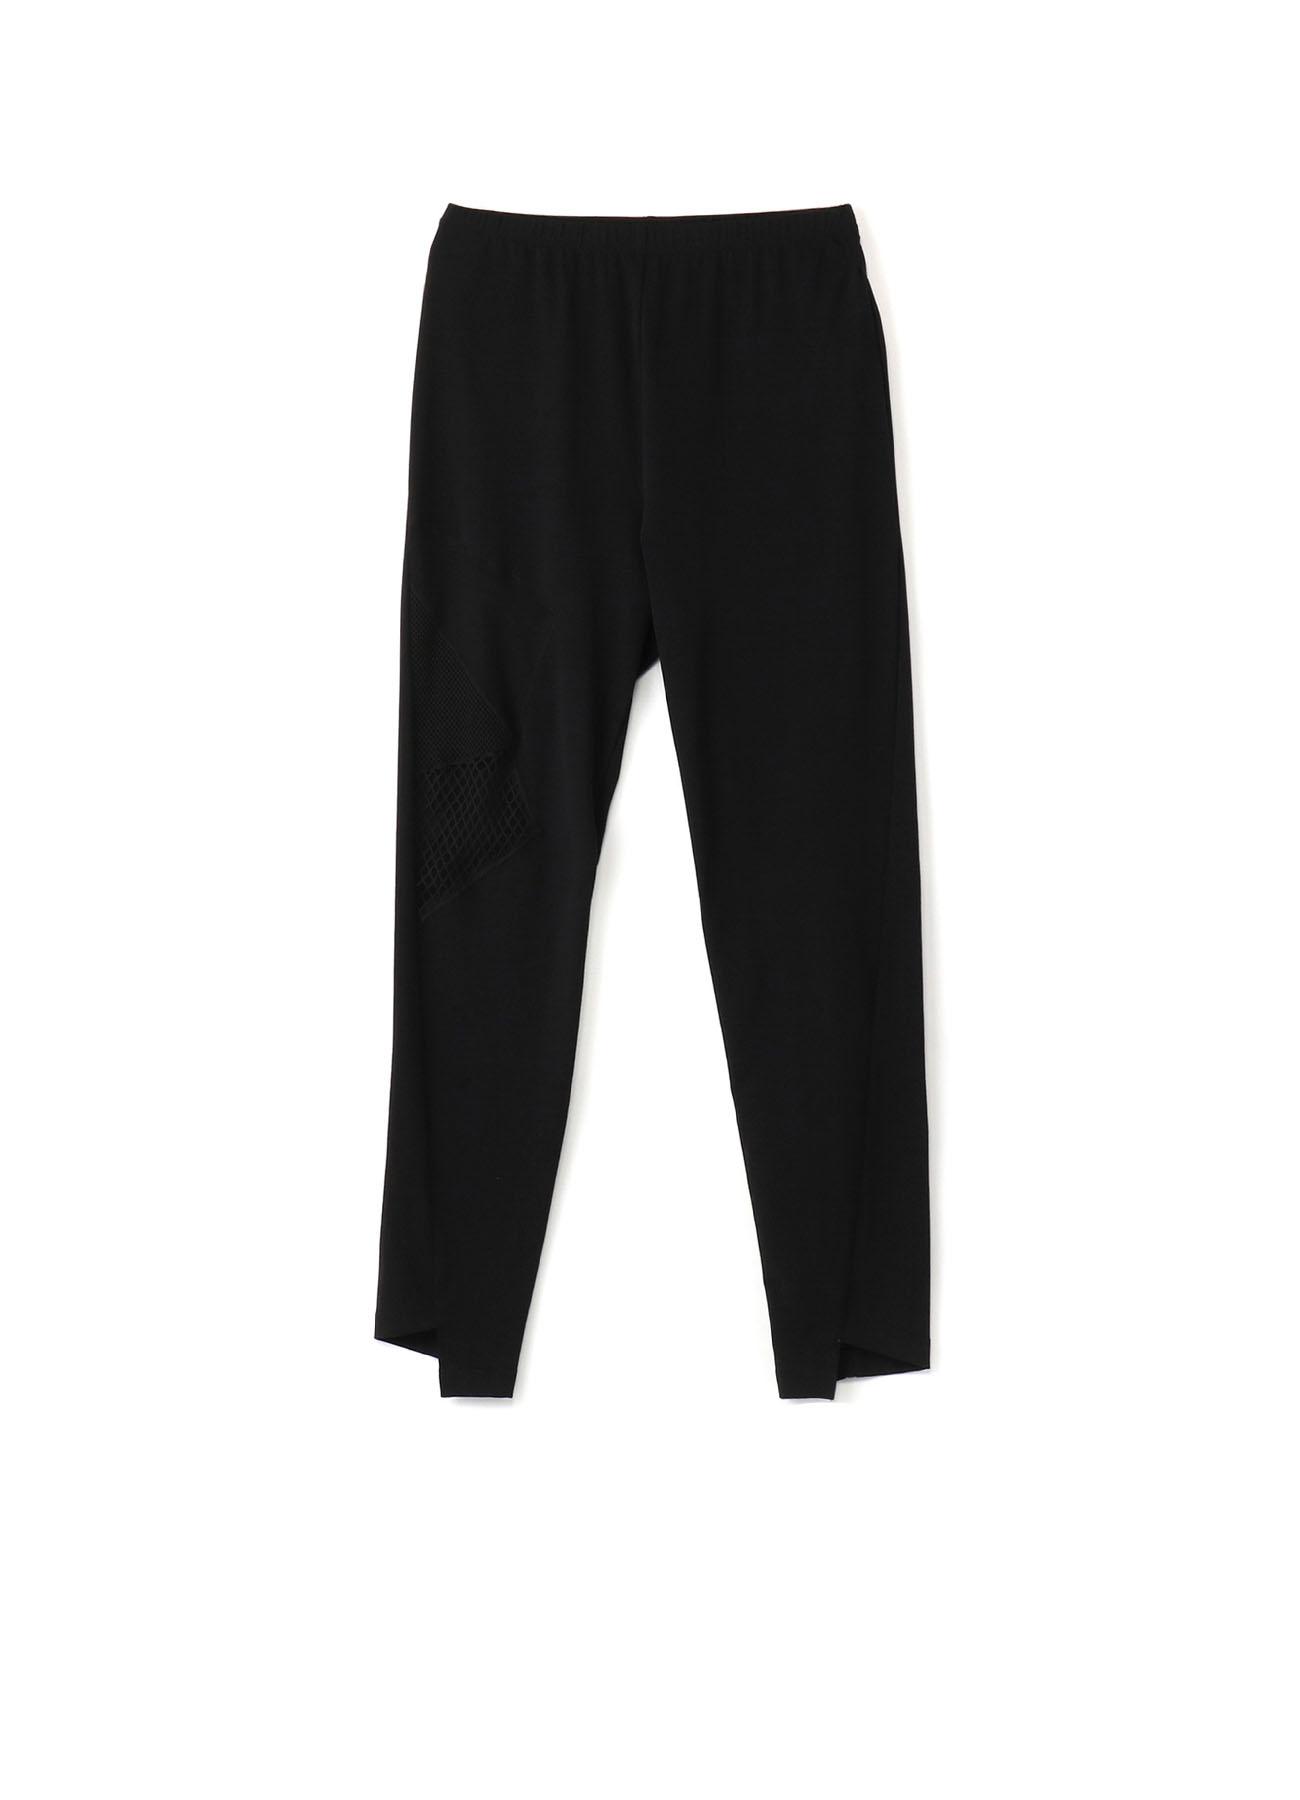 Mesh Patchwork B Twist Pants